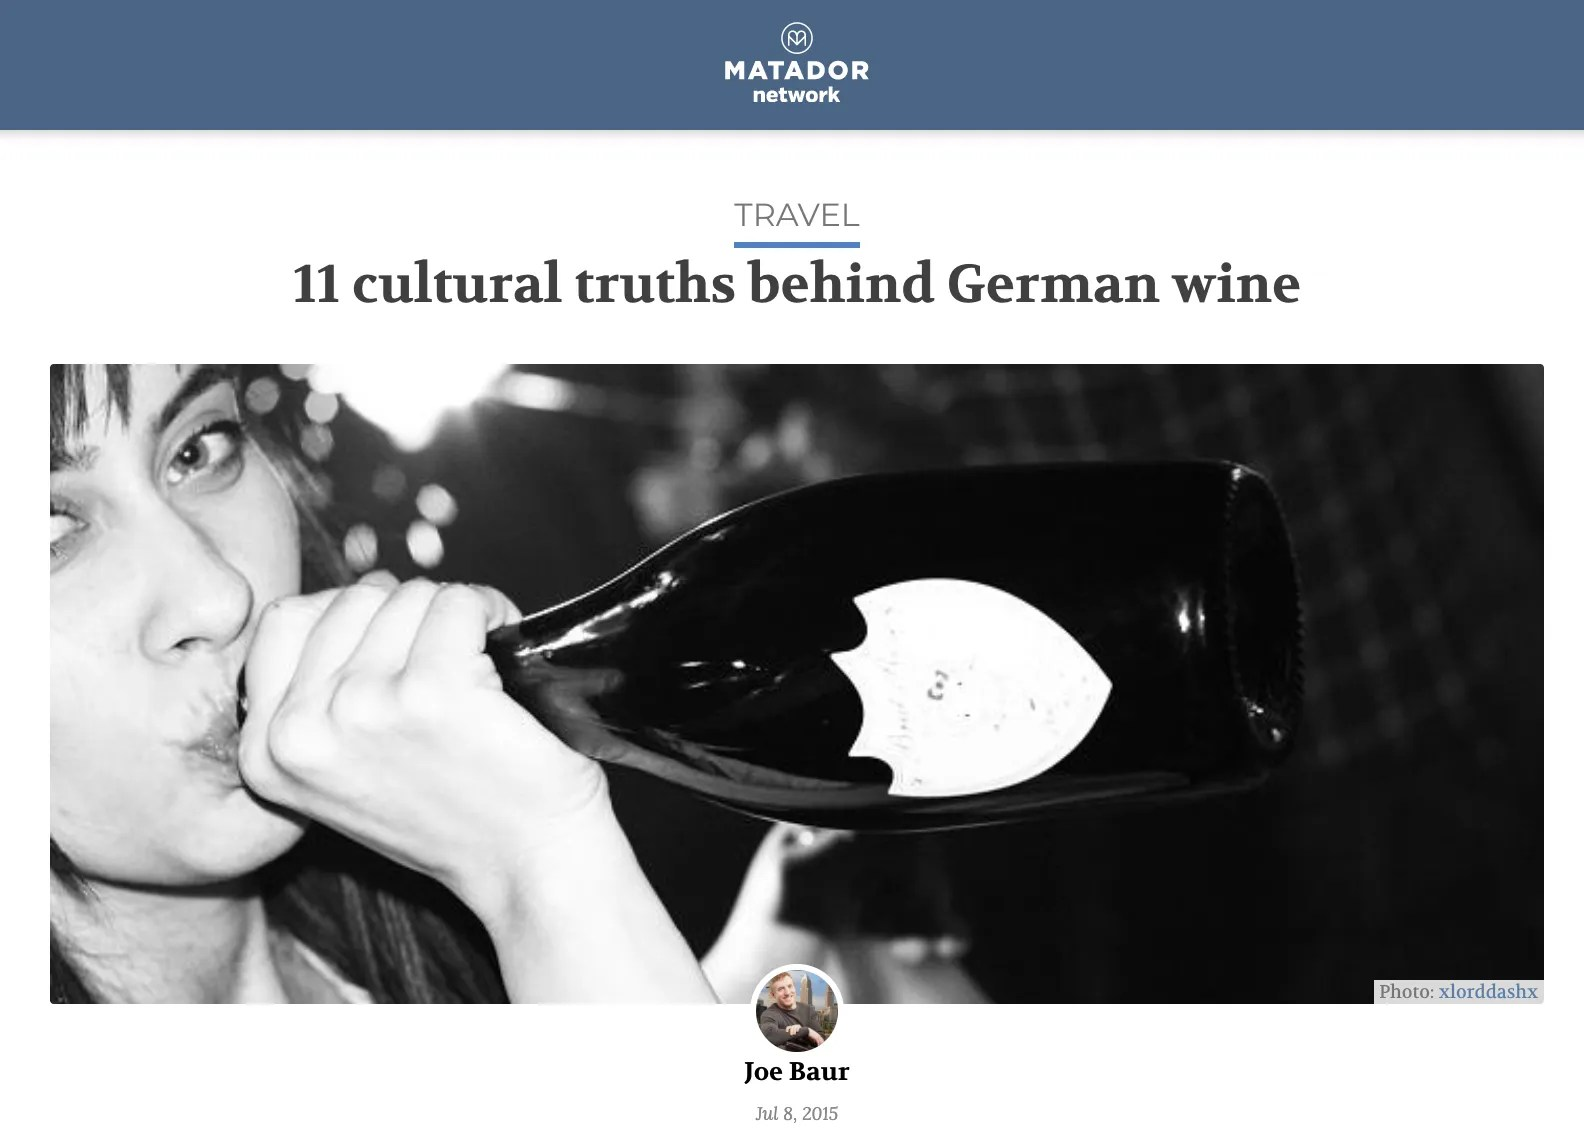 11 cultural truths behind German wine - Matador Network